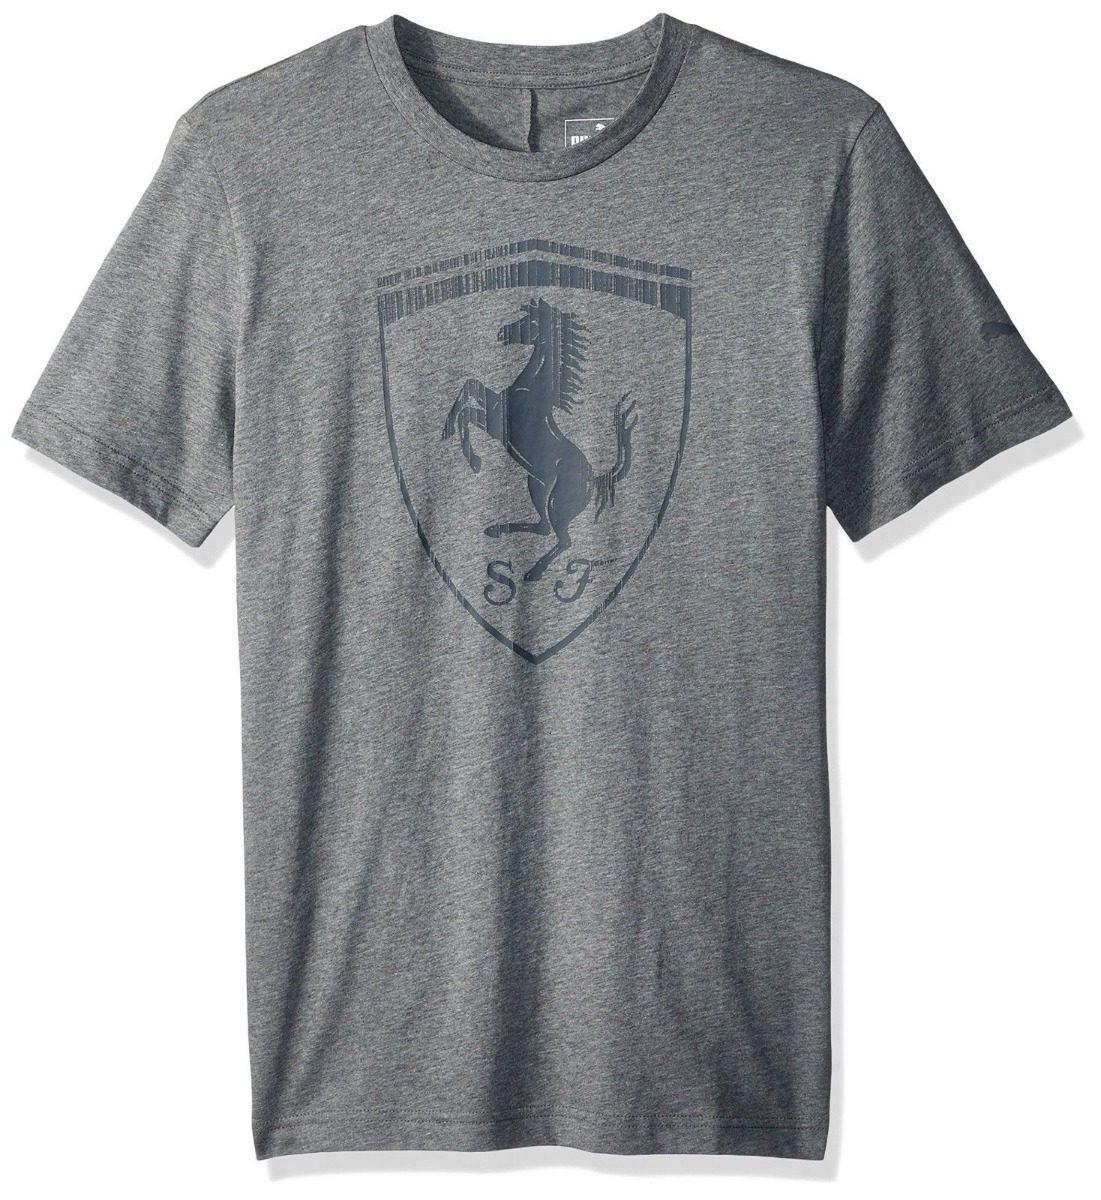 camiseta puma ferrari big shield masculina cinza. Carregando zoom. e6a09fcf6e0